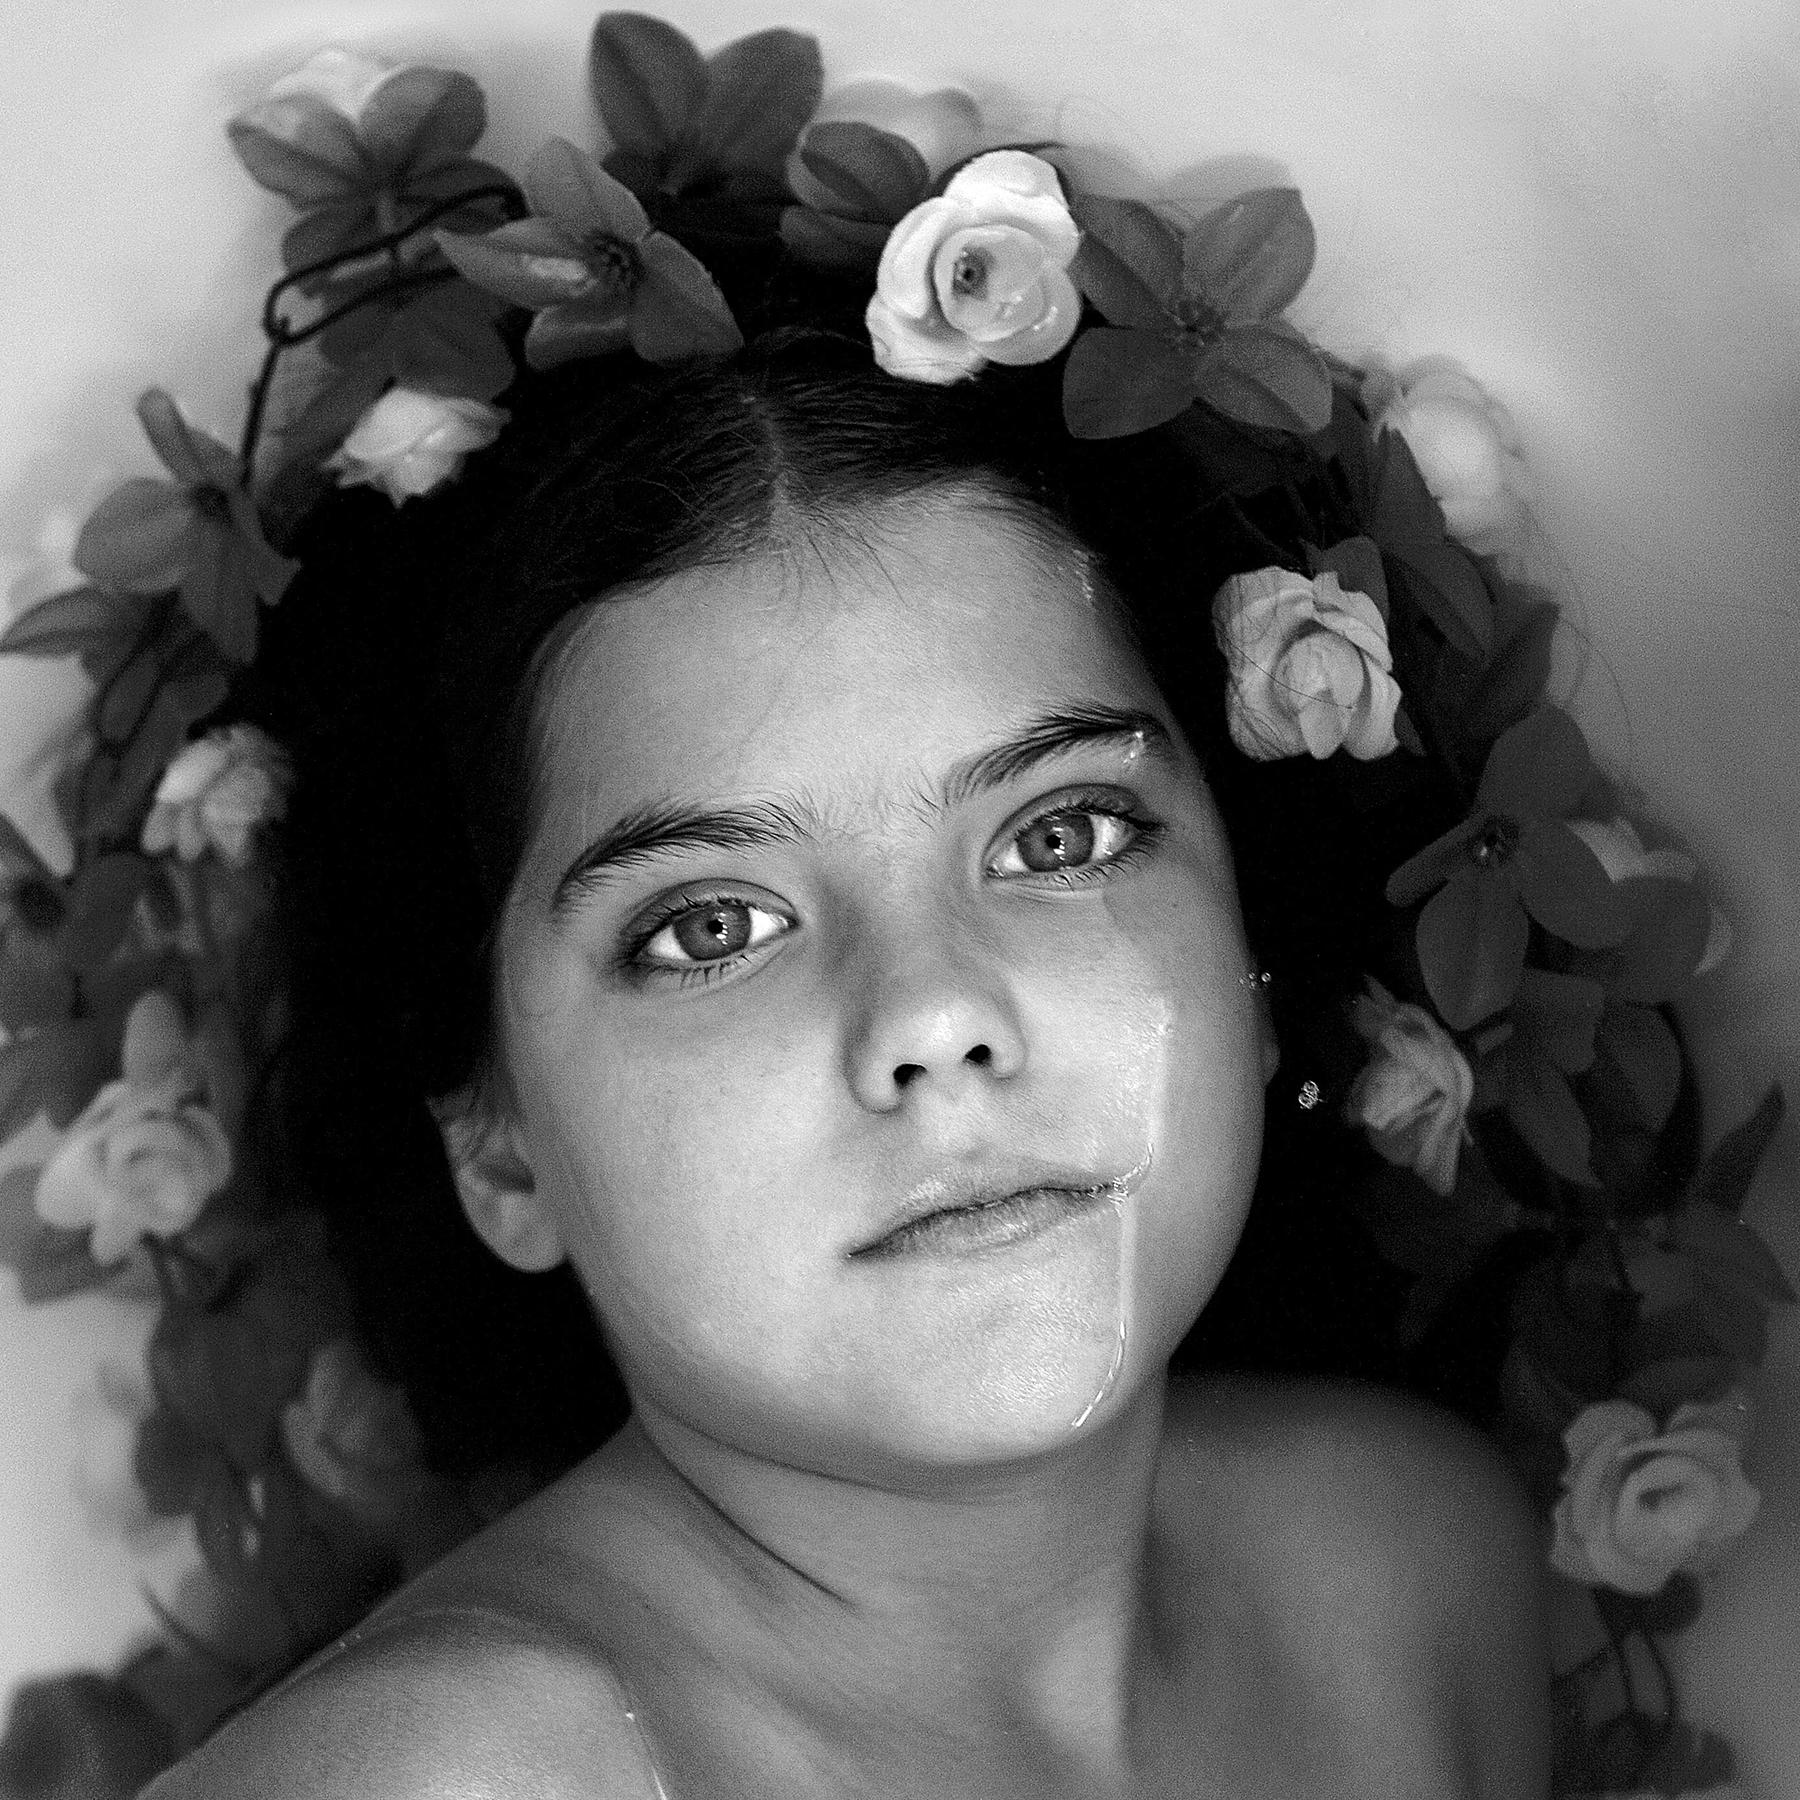 Candy_Lopesino_IBERIA CHILDREN_No title_06.jpg